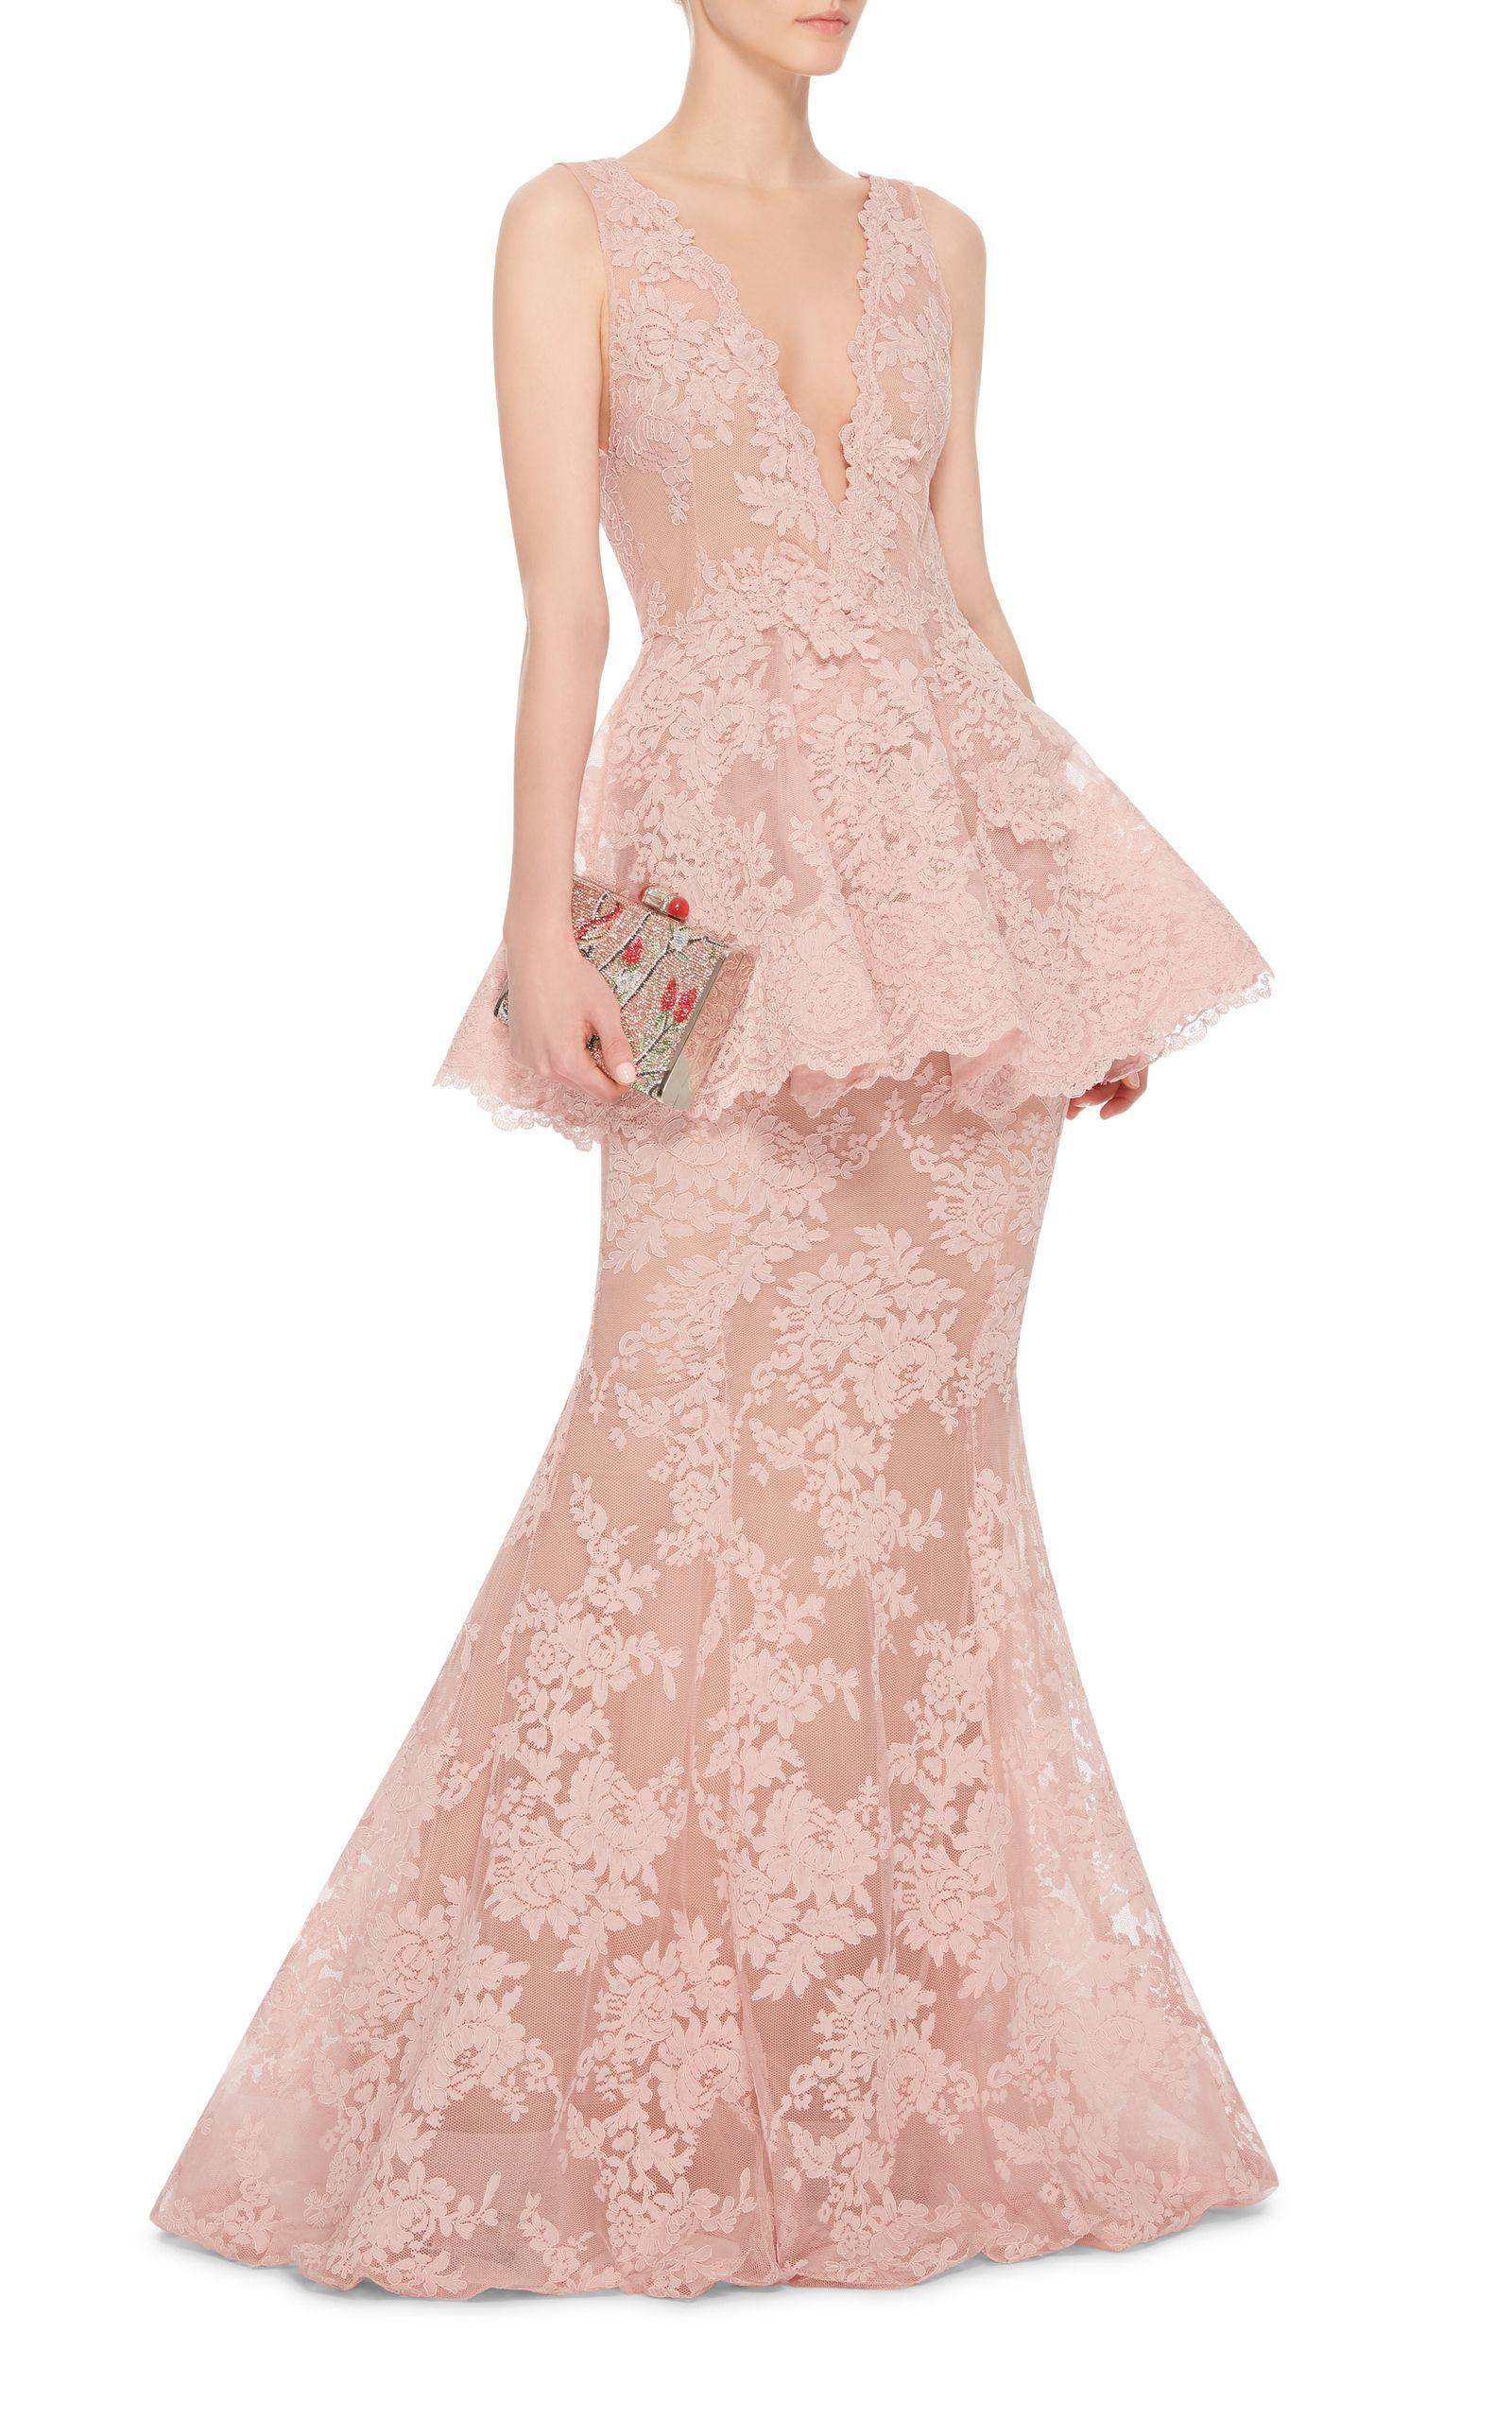 Marchesa Lace Peplum Gown   Dresses   Pinterest   Eventos